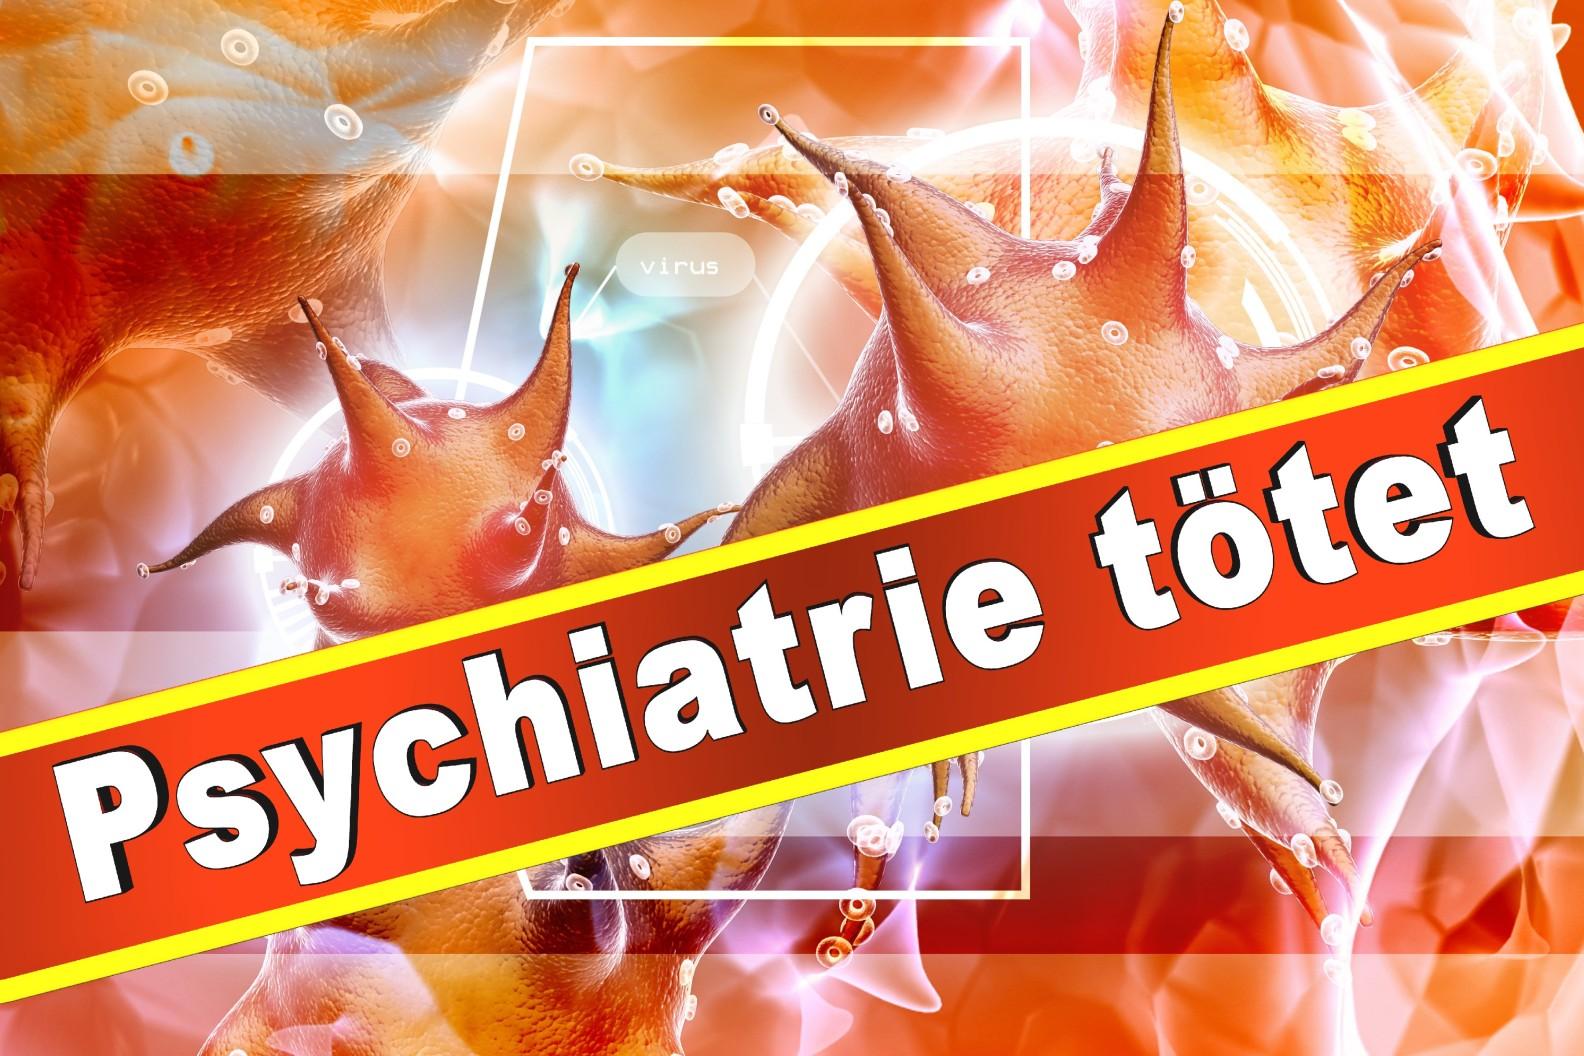 Psychiatrie Und Psychotherapie Gustav Hirschfeld Ring Coburg